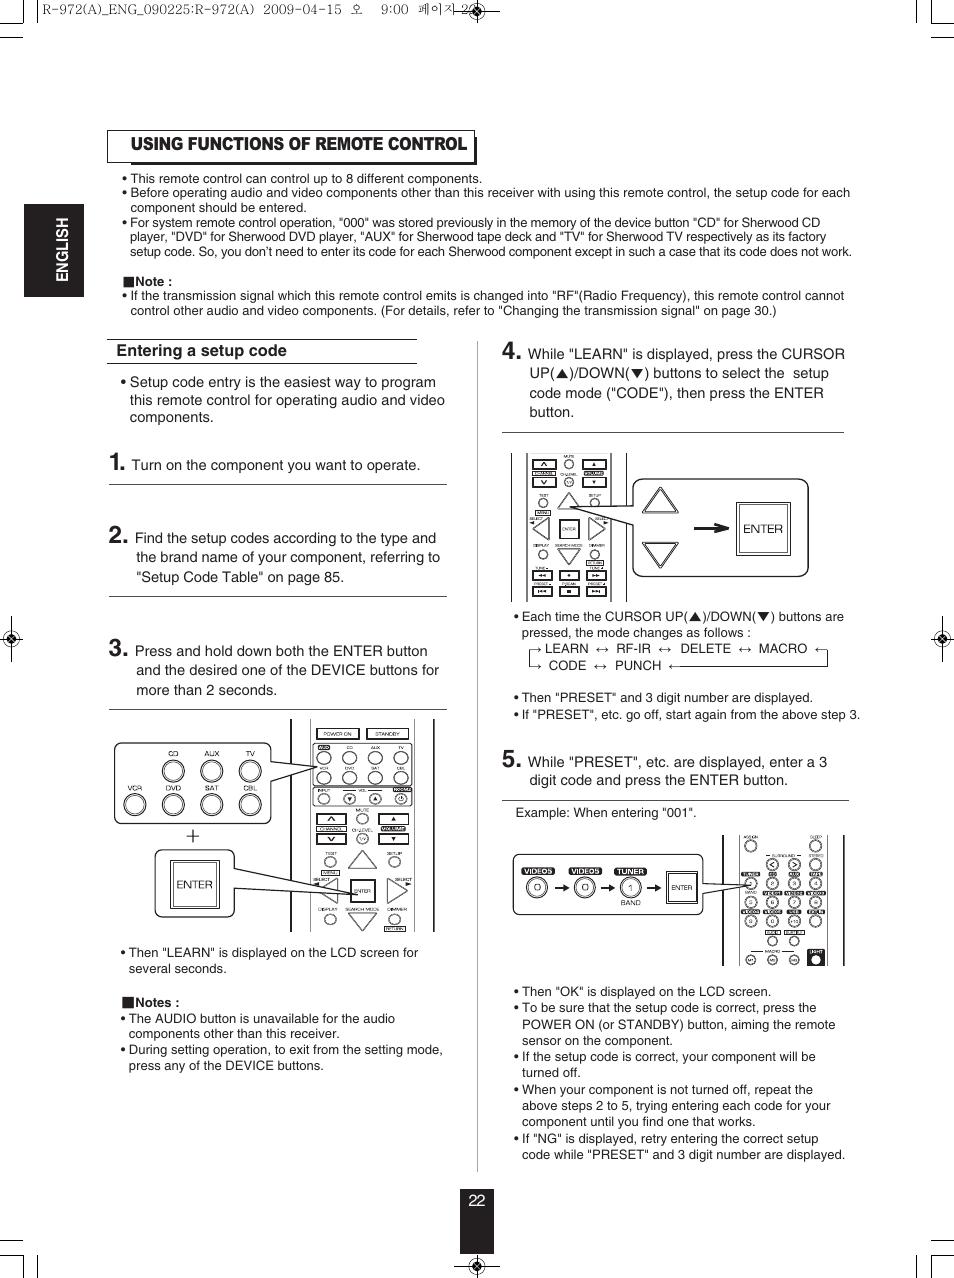 Sherwood Newcastle R-972 User Manual | Page 22 / 92